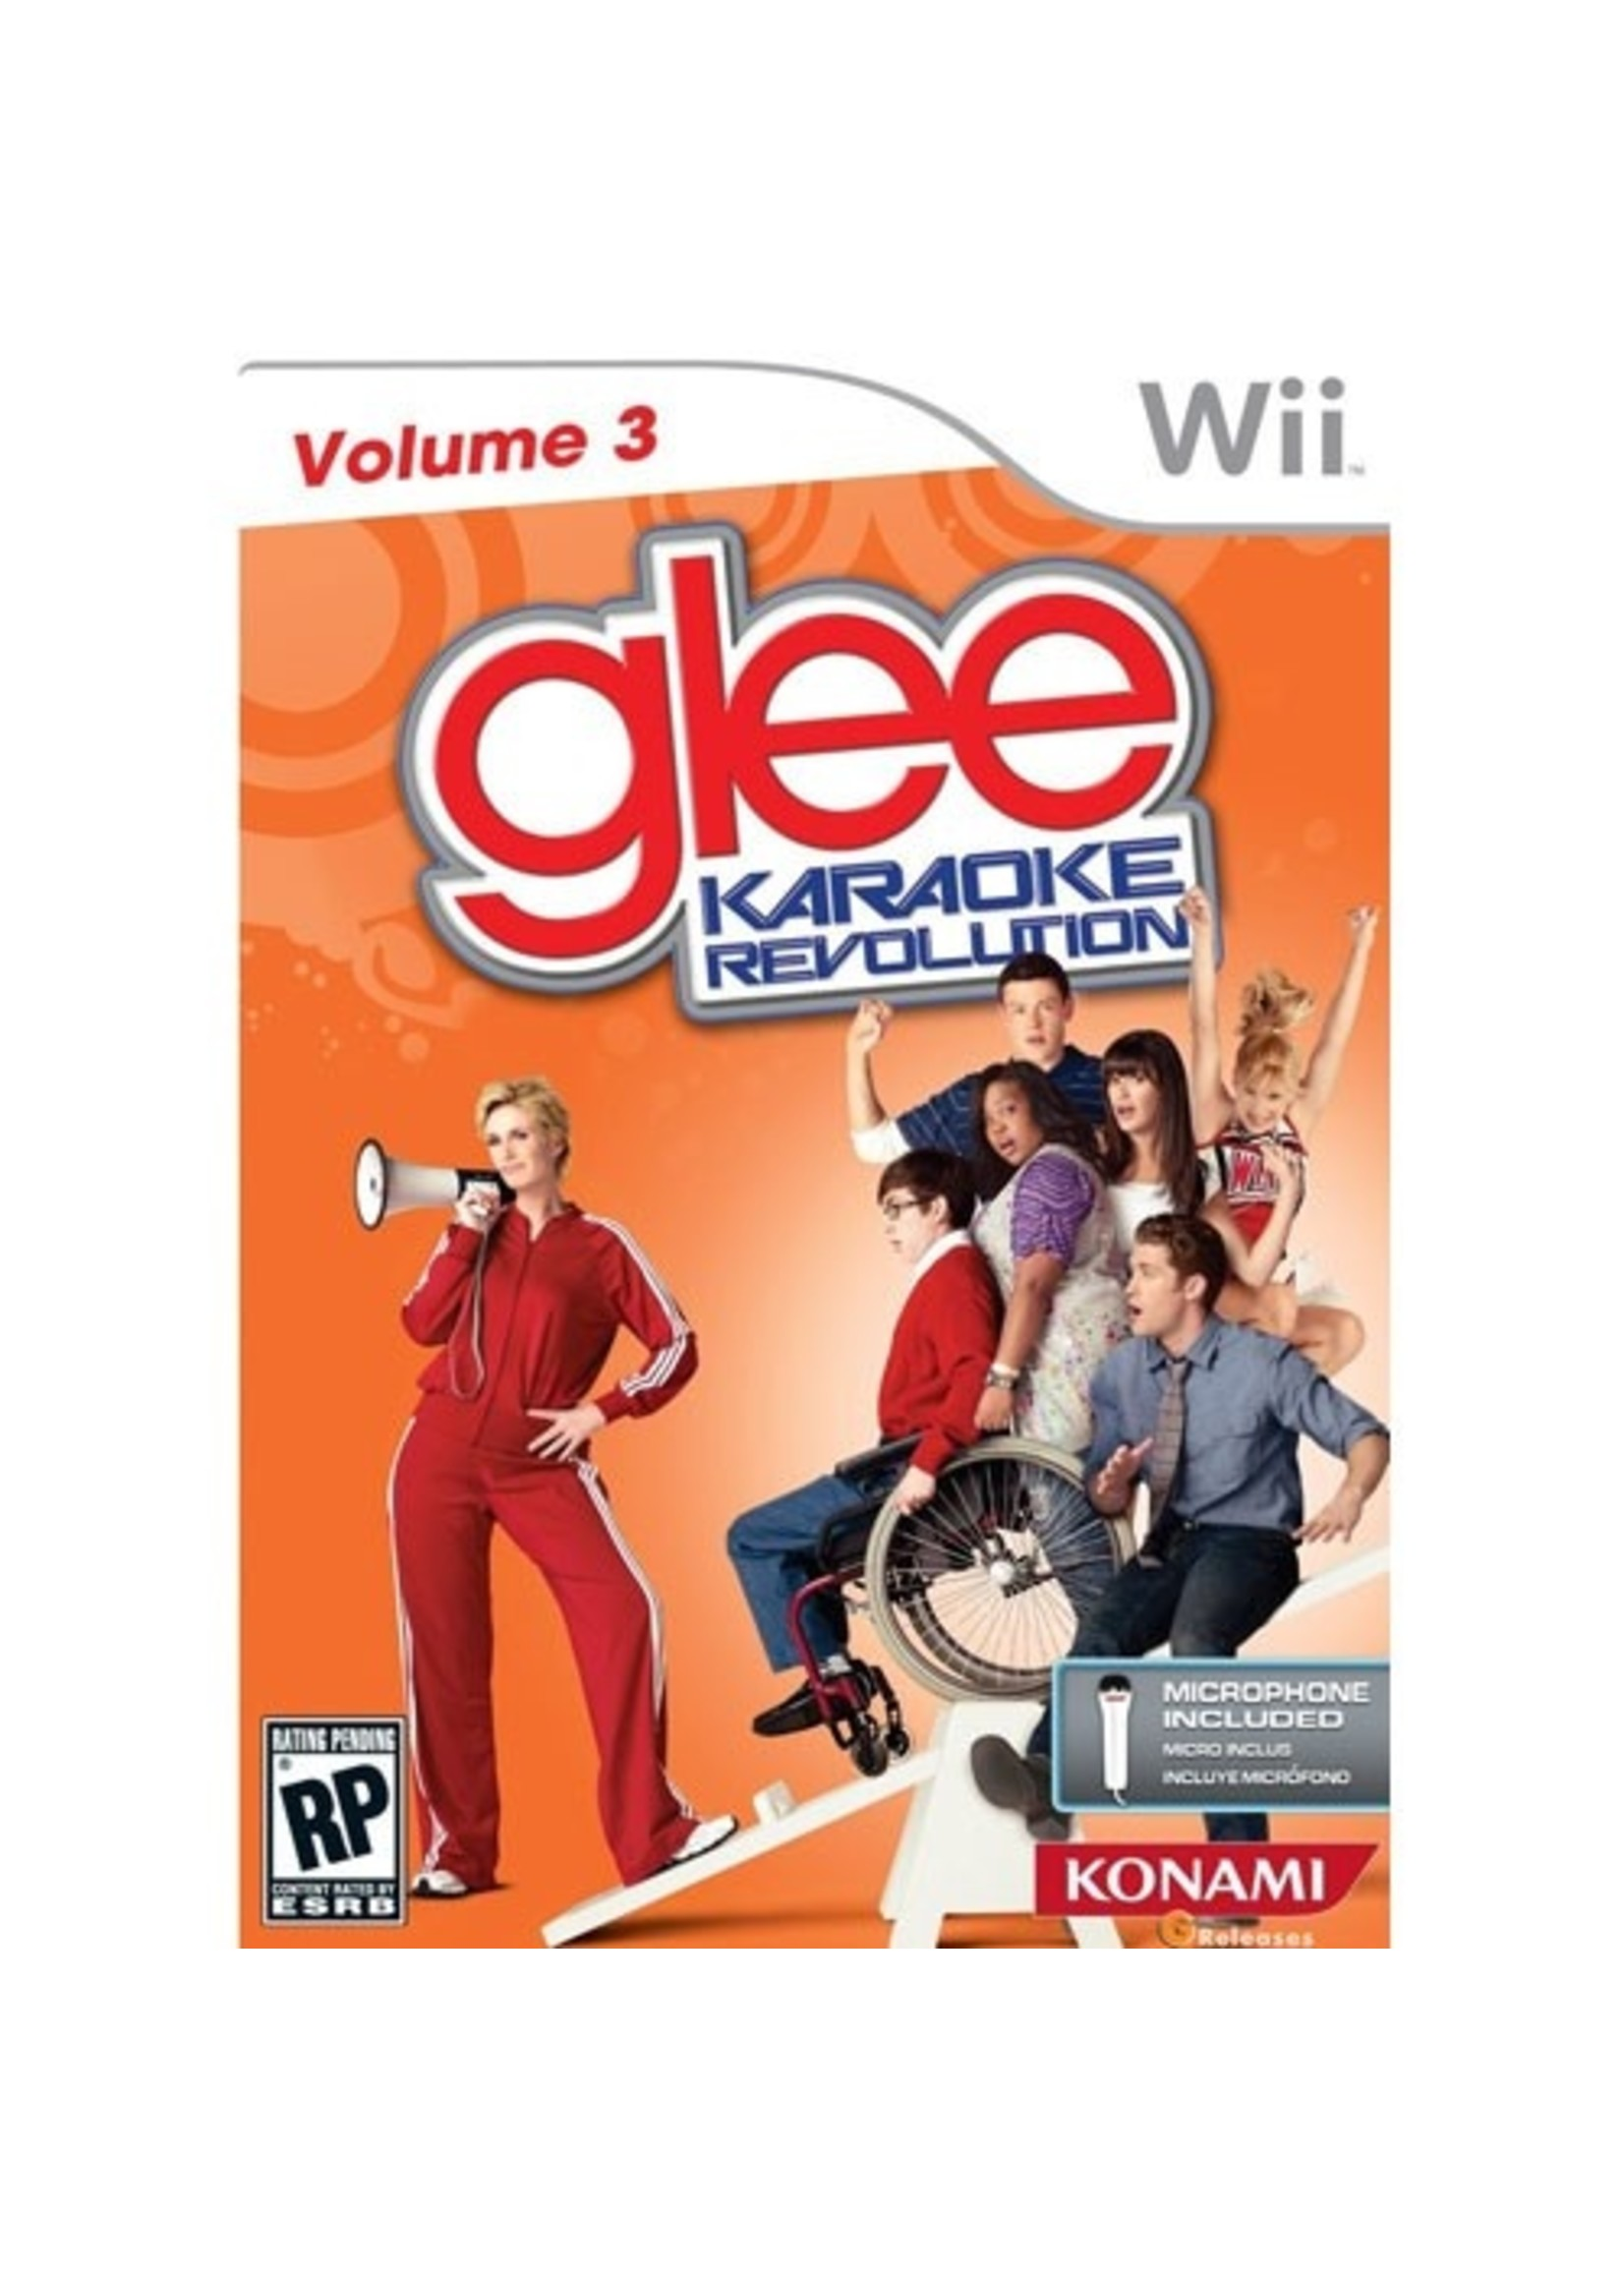 Glee Karaoke Revolution Vol. 3 - Wii PrePlayed